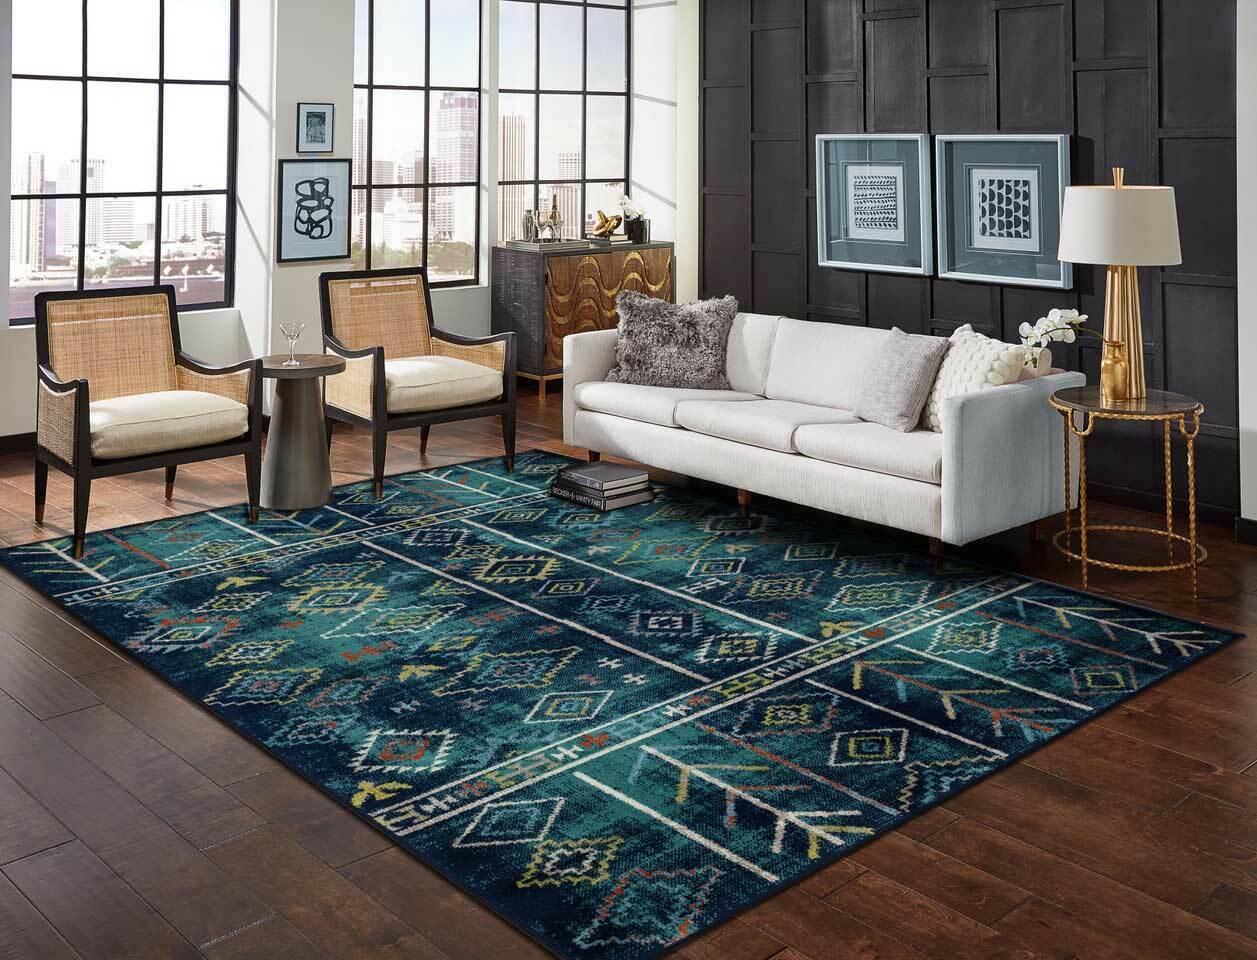 Modern Area Rugs 8×10 Living Room Rugs 8×11 MultiColor Floor Carpet 5×7 Area Rugs